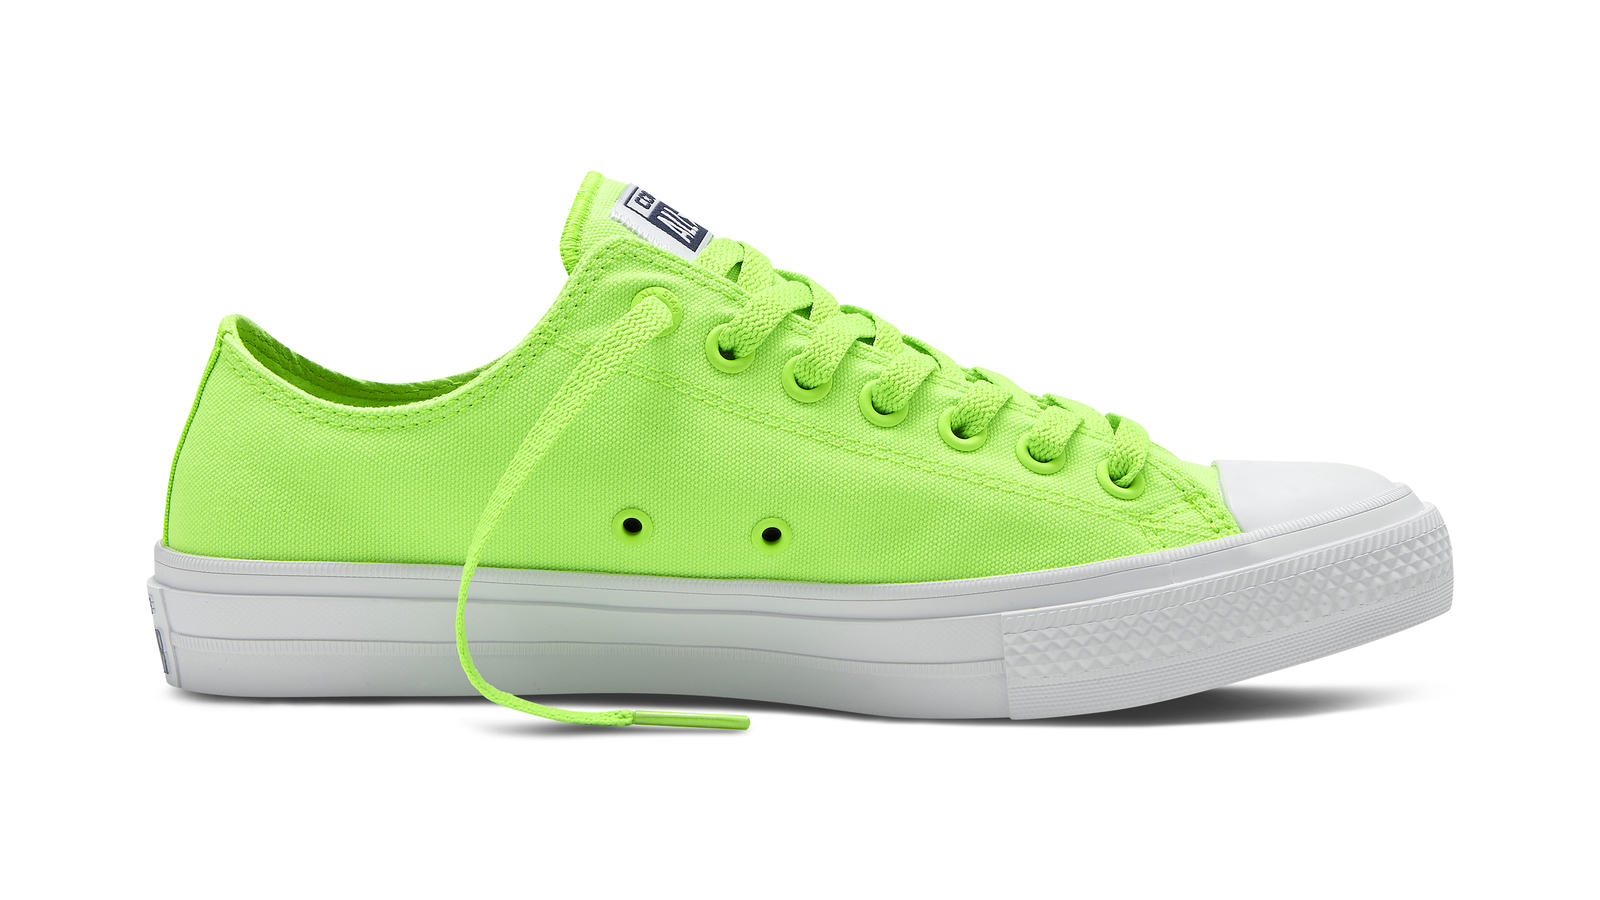 84eee2da4a2 ... lo neon sneaker green 399335 cdf8b 890ab  netherlands converse chuck  taylor all star ii neon volt low top original 64e75 bd6ff